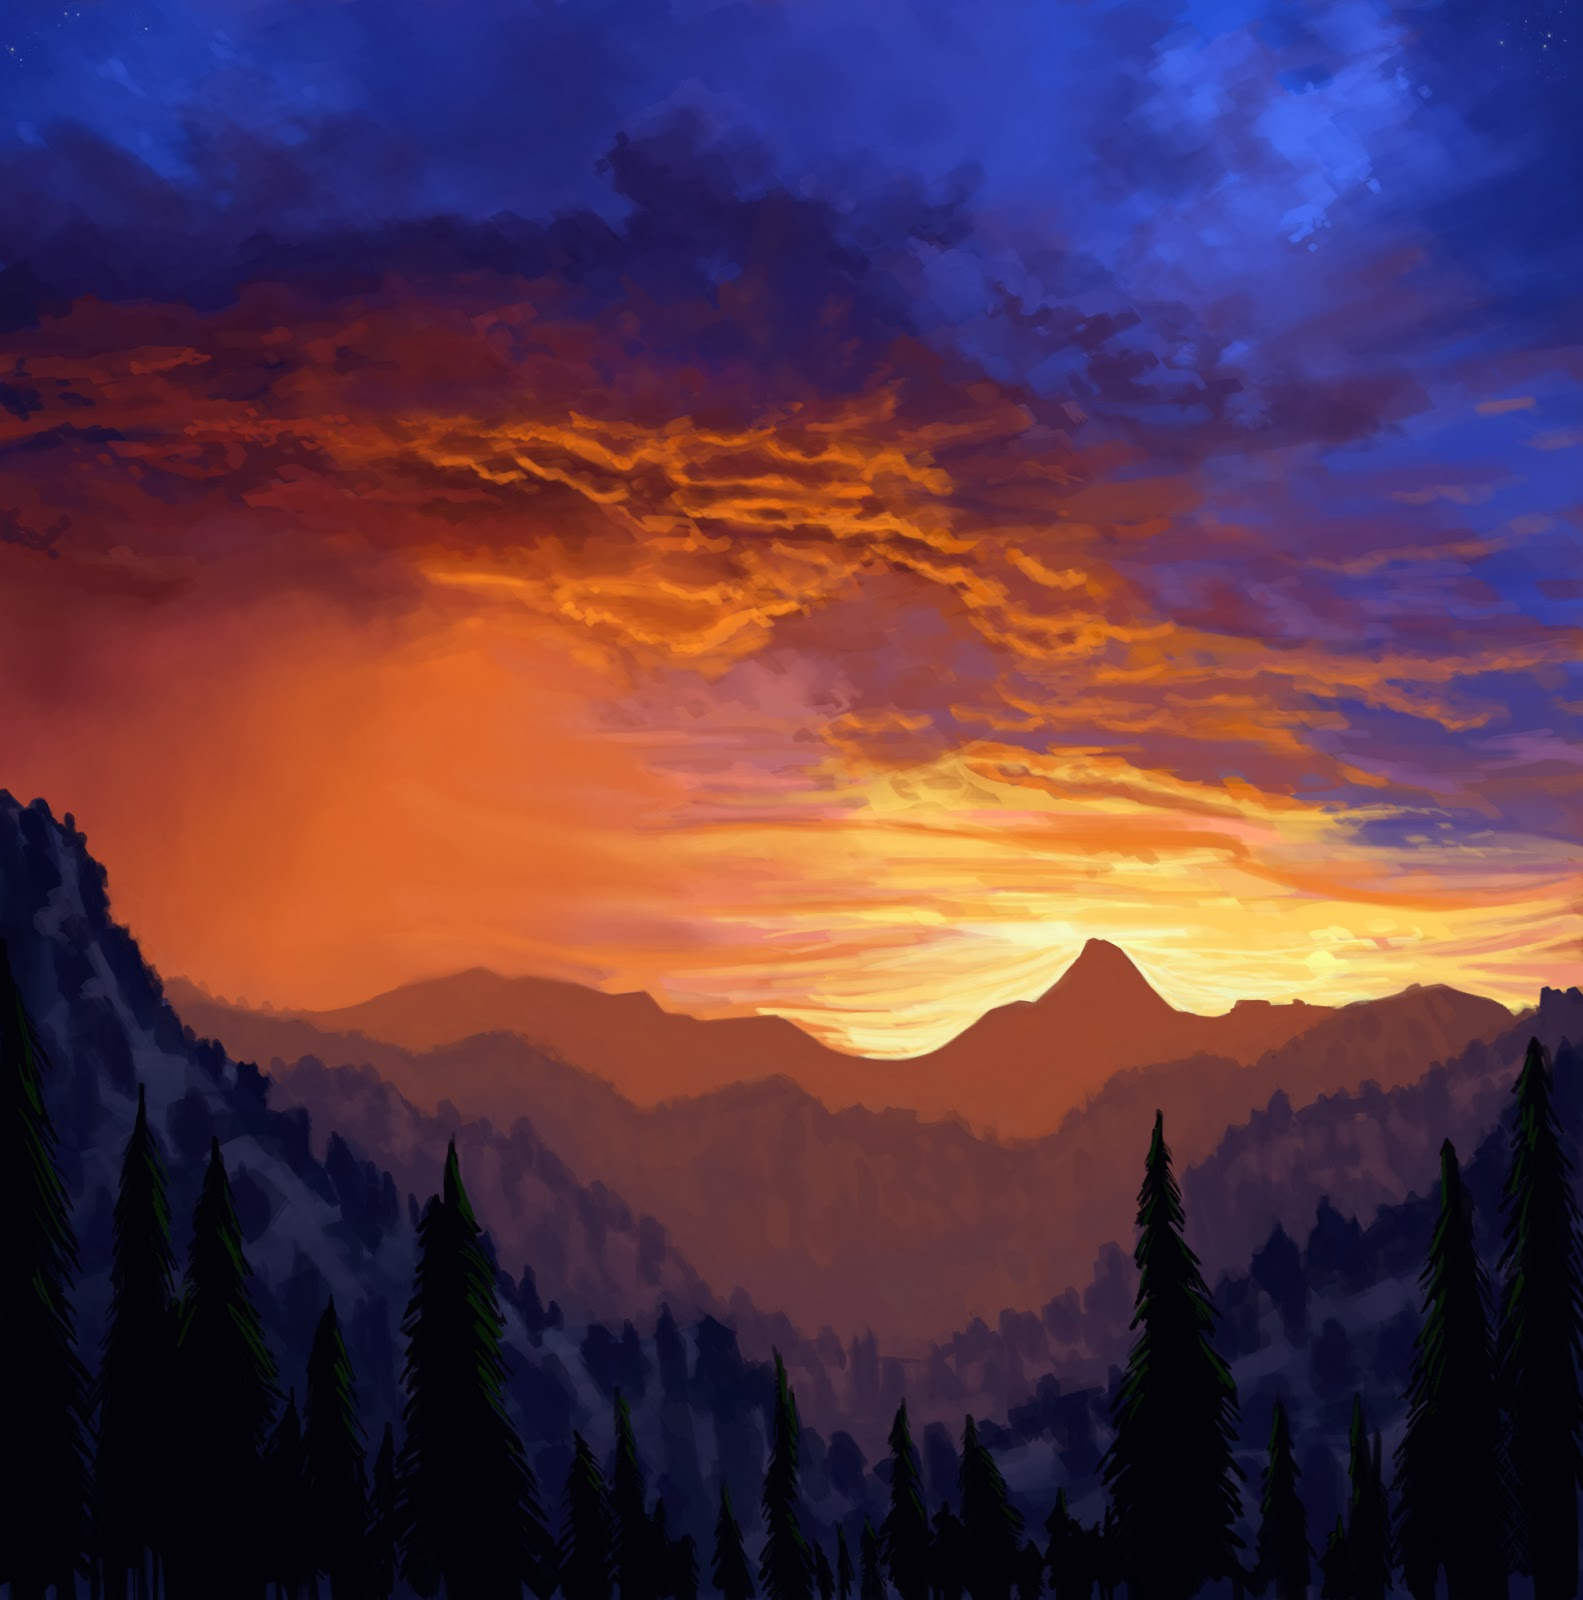 Doin' Work .: Sunset Storm